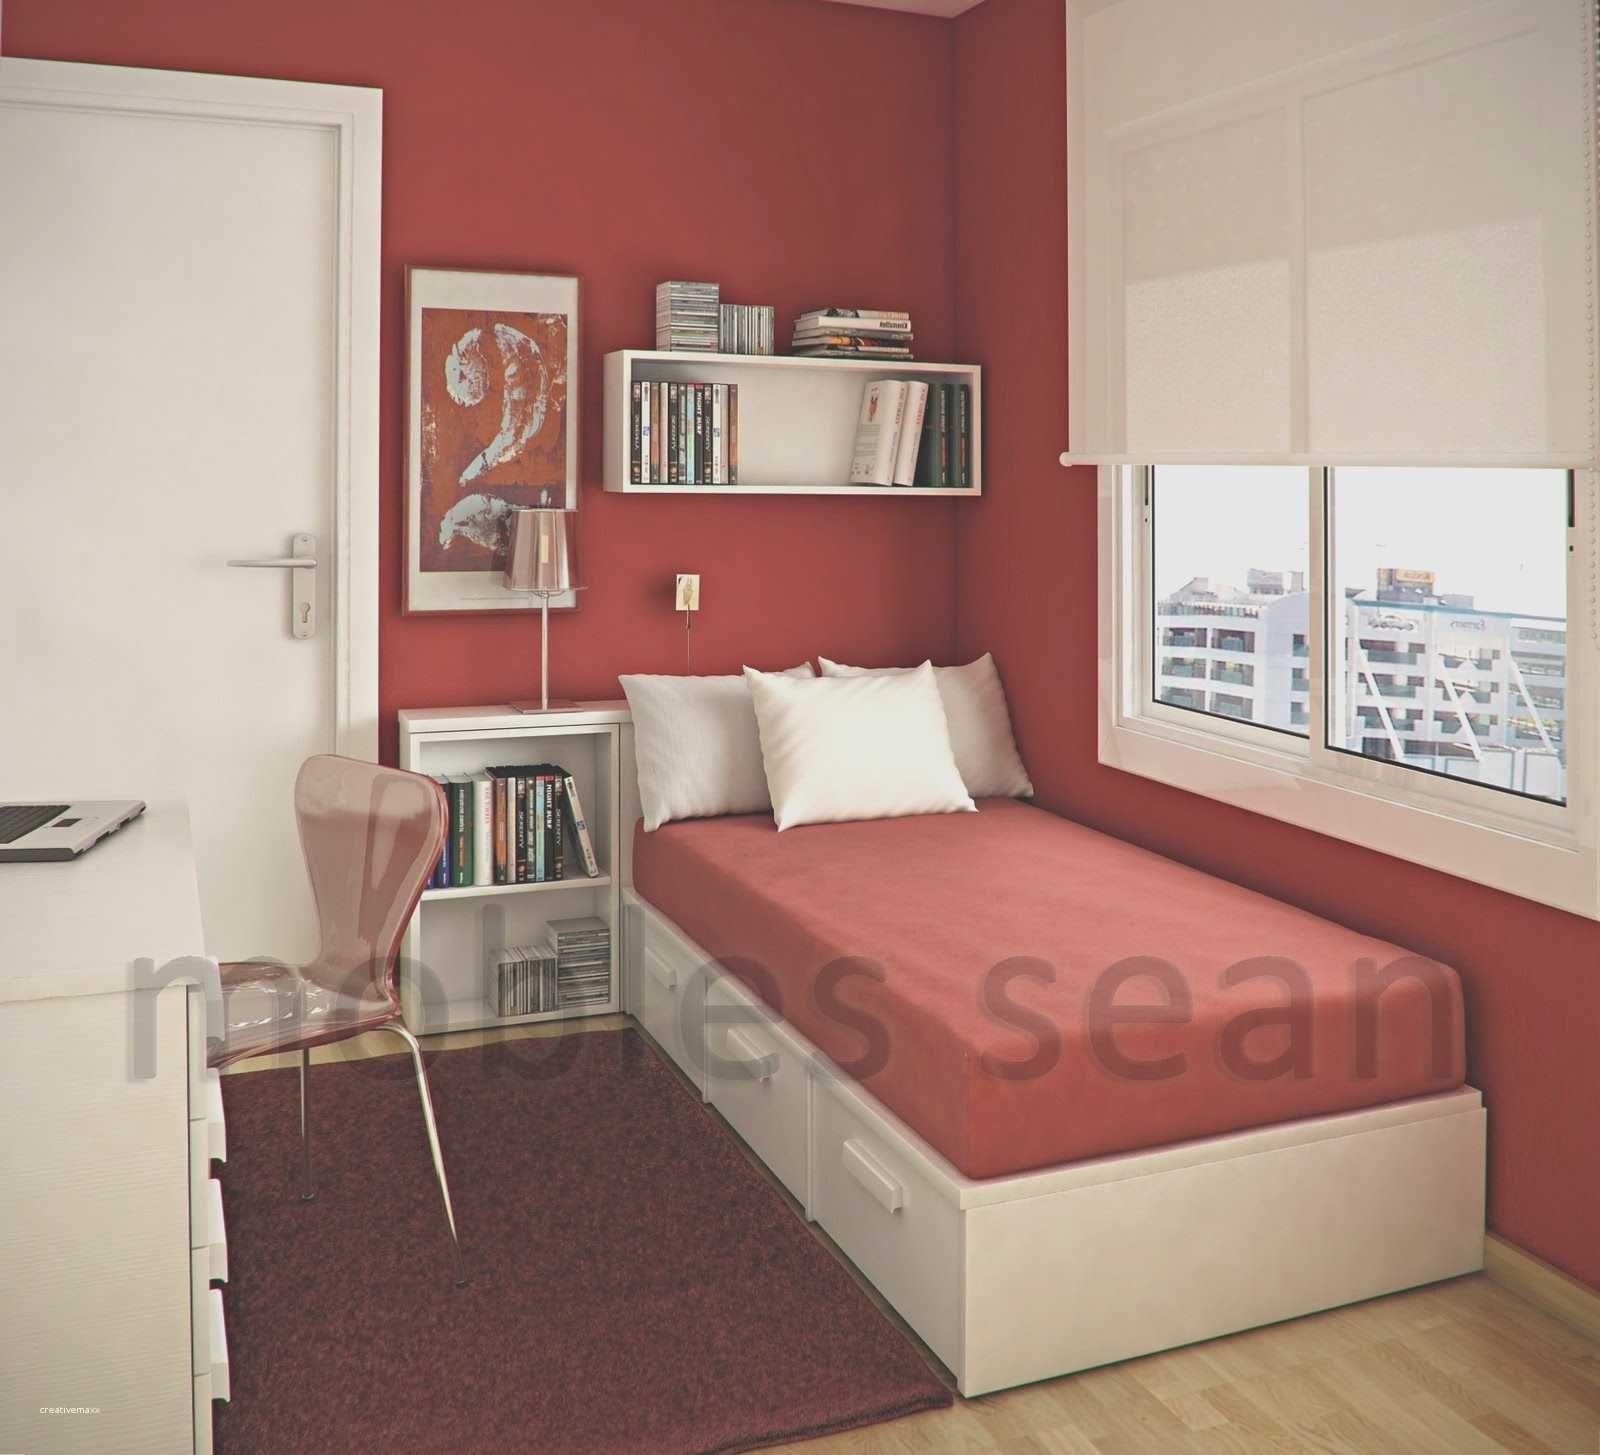 Beautiful Indian Bedroom Wardrobe Designs with 15 Photos #indischesschlafzimmer